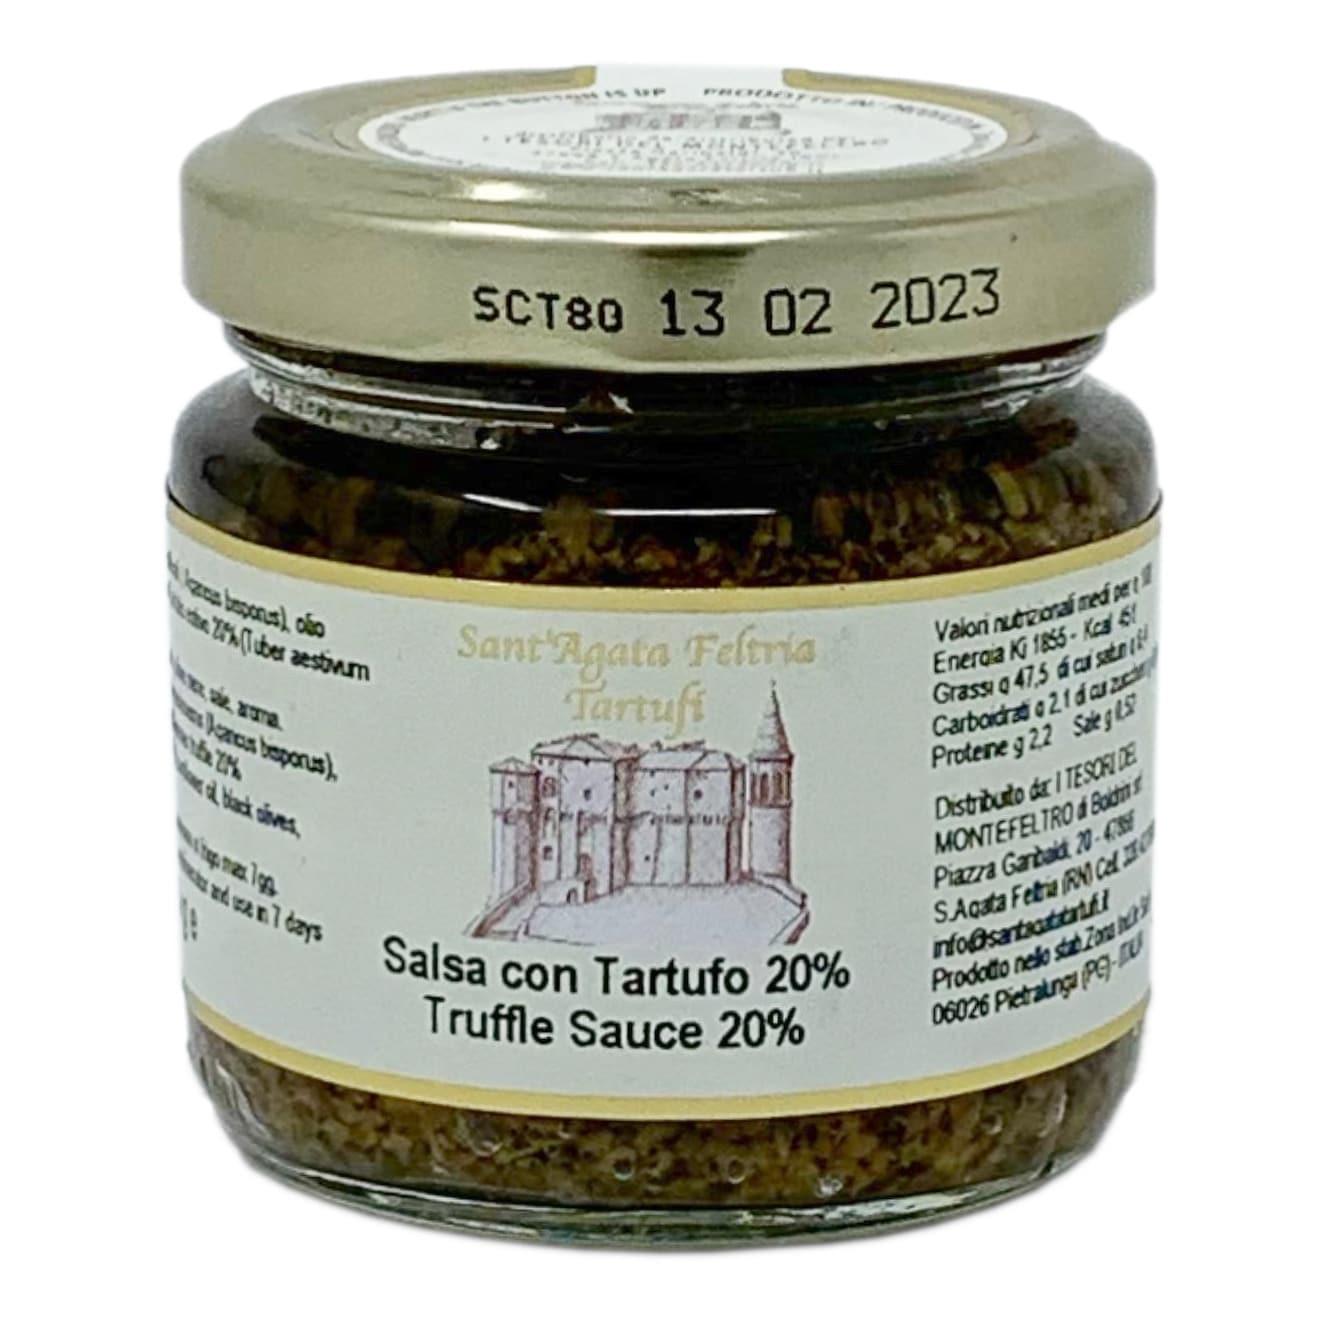 SALSA CON TARTUFO 20% 80G Sant'Agata Feltria Tartufi - prodotti tipici romagnoli